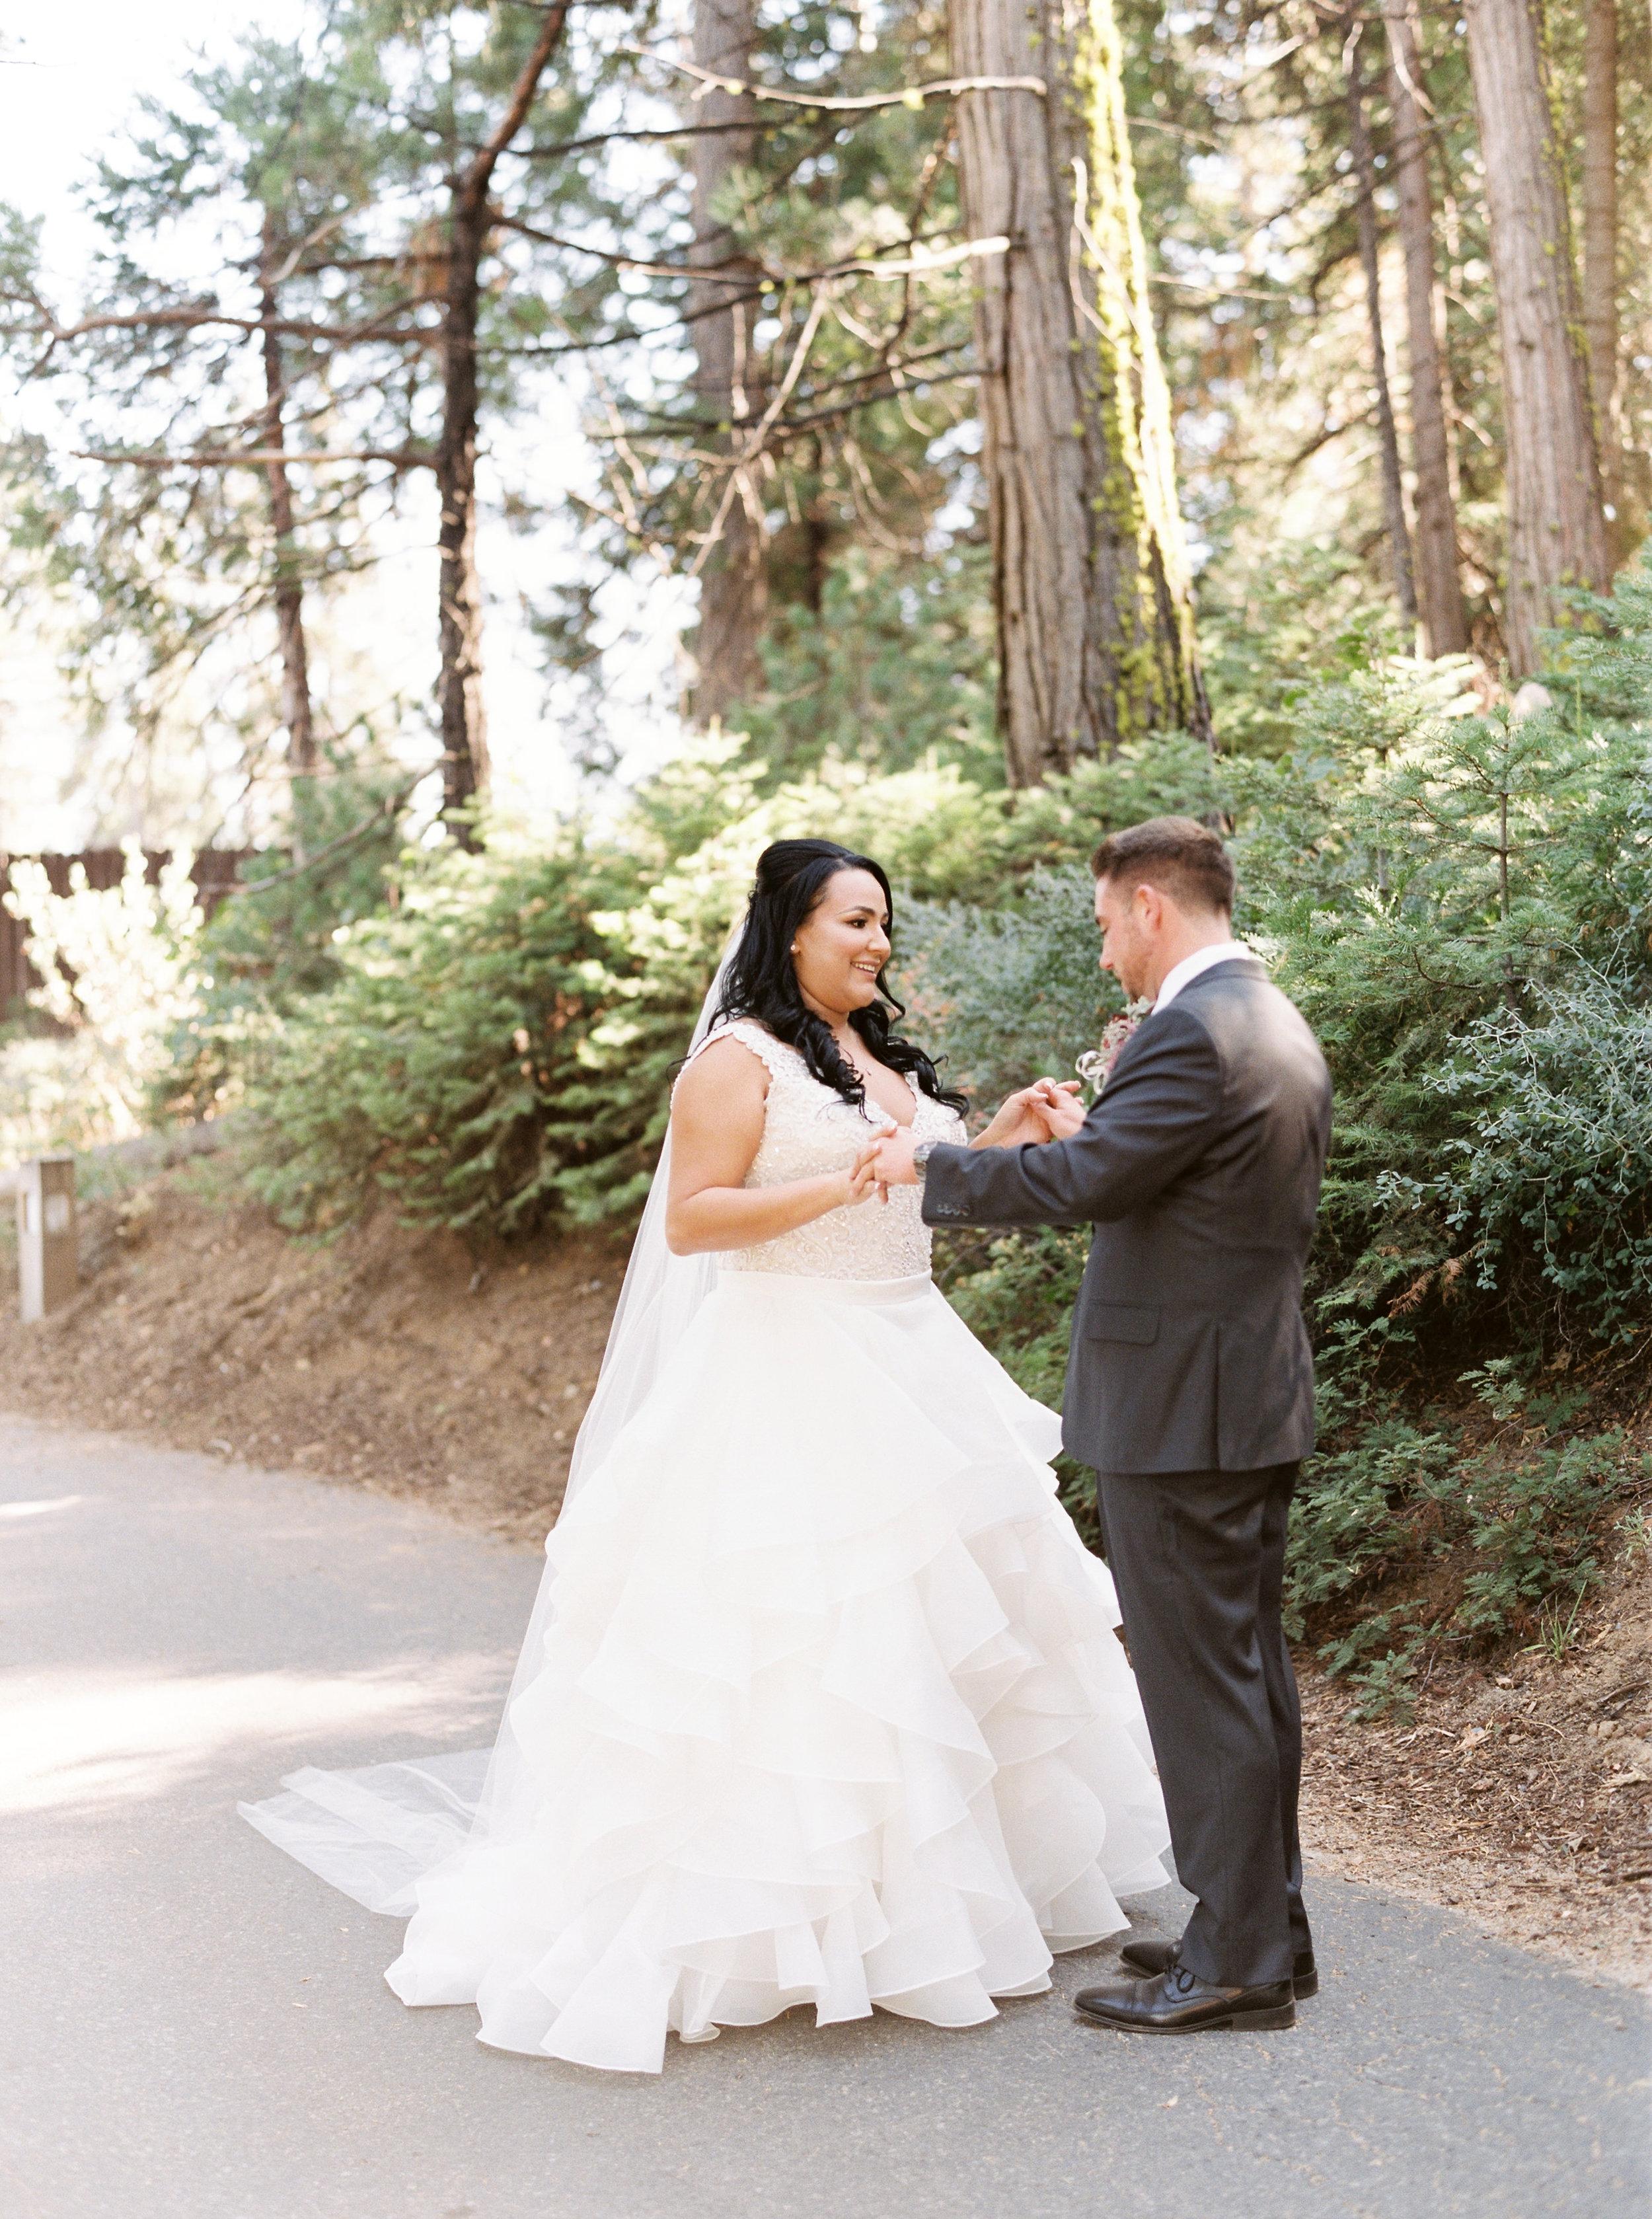 Tenaya-lodge-wedding-at-yosemite-national-park-california-64.jpg